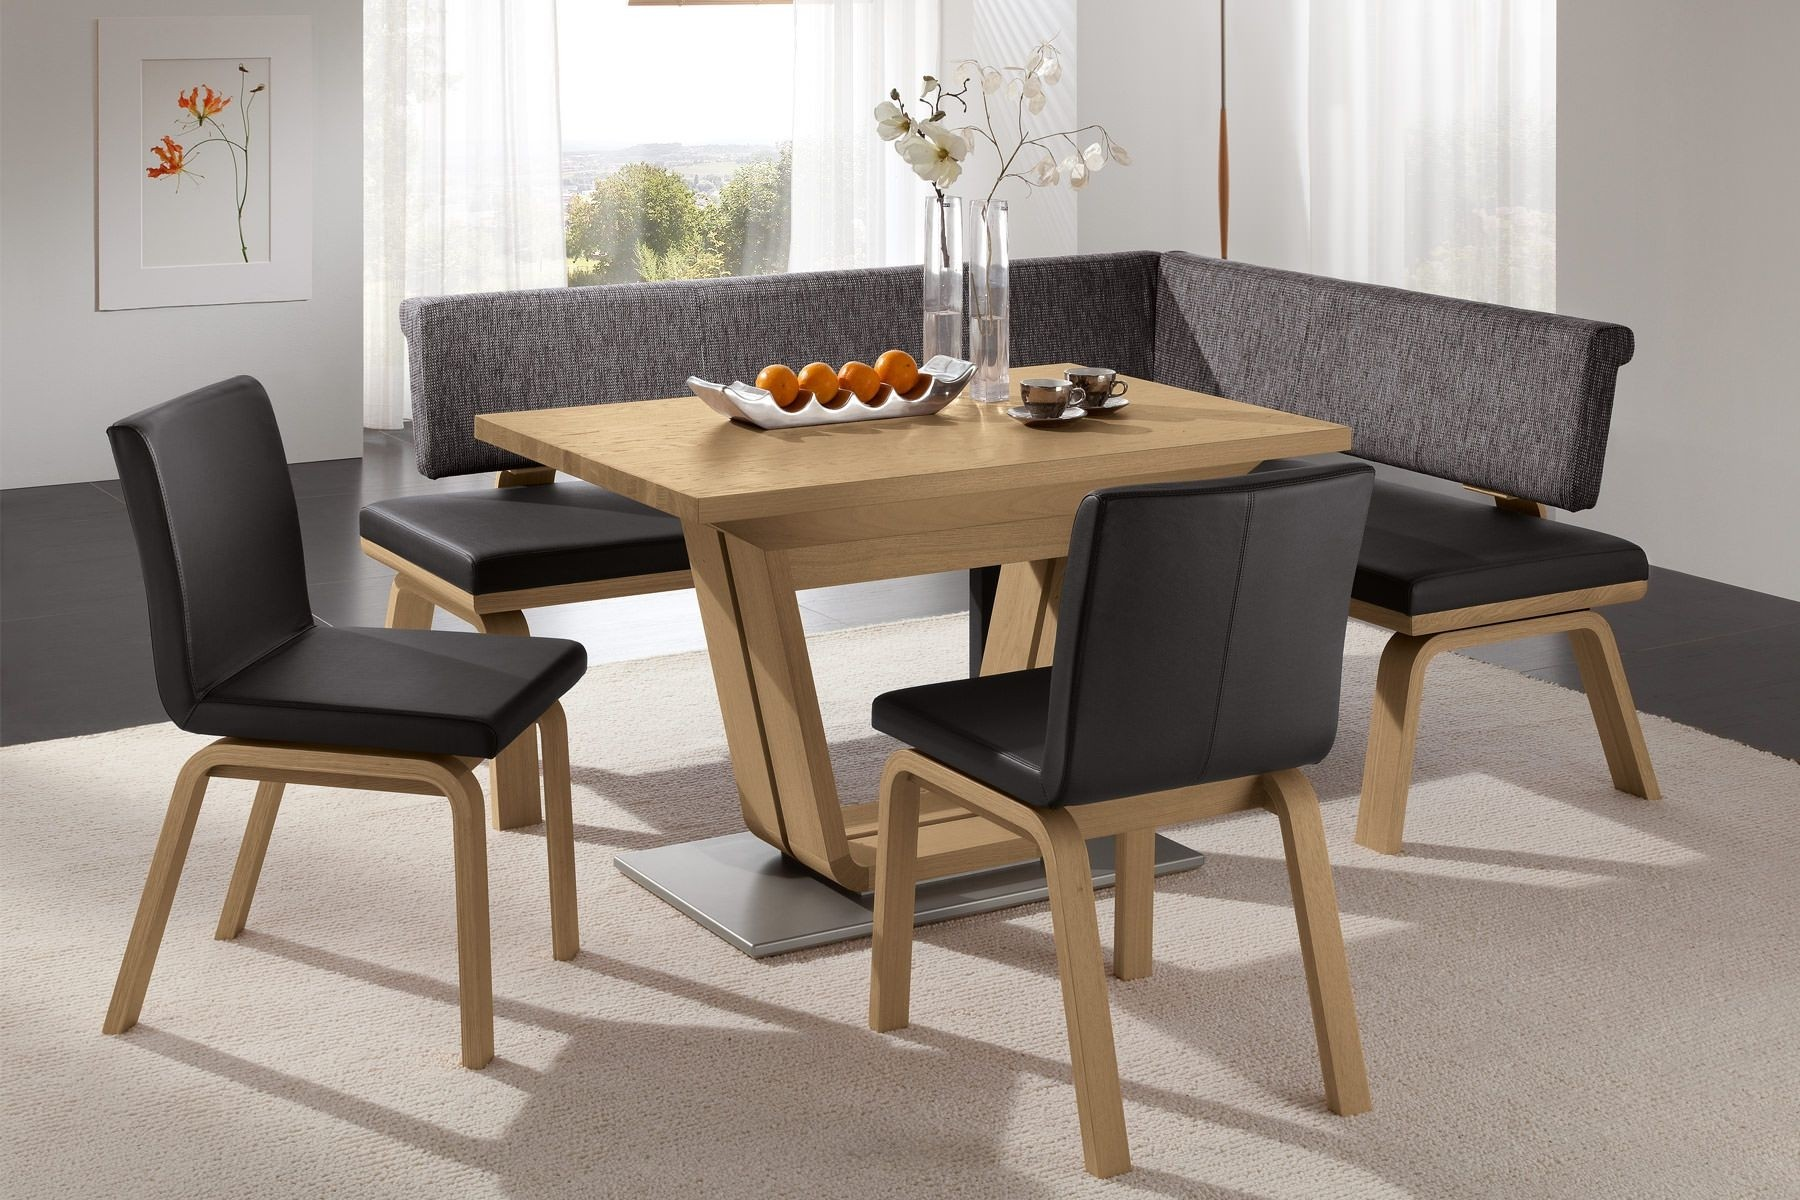 Corner Bench Dining Table Set Reviews Furniture Dining Room